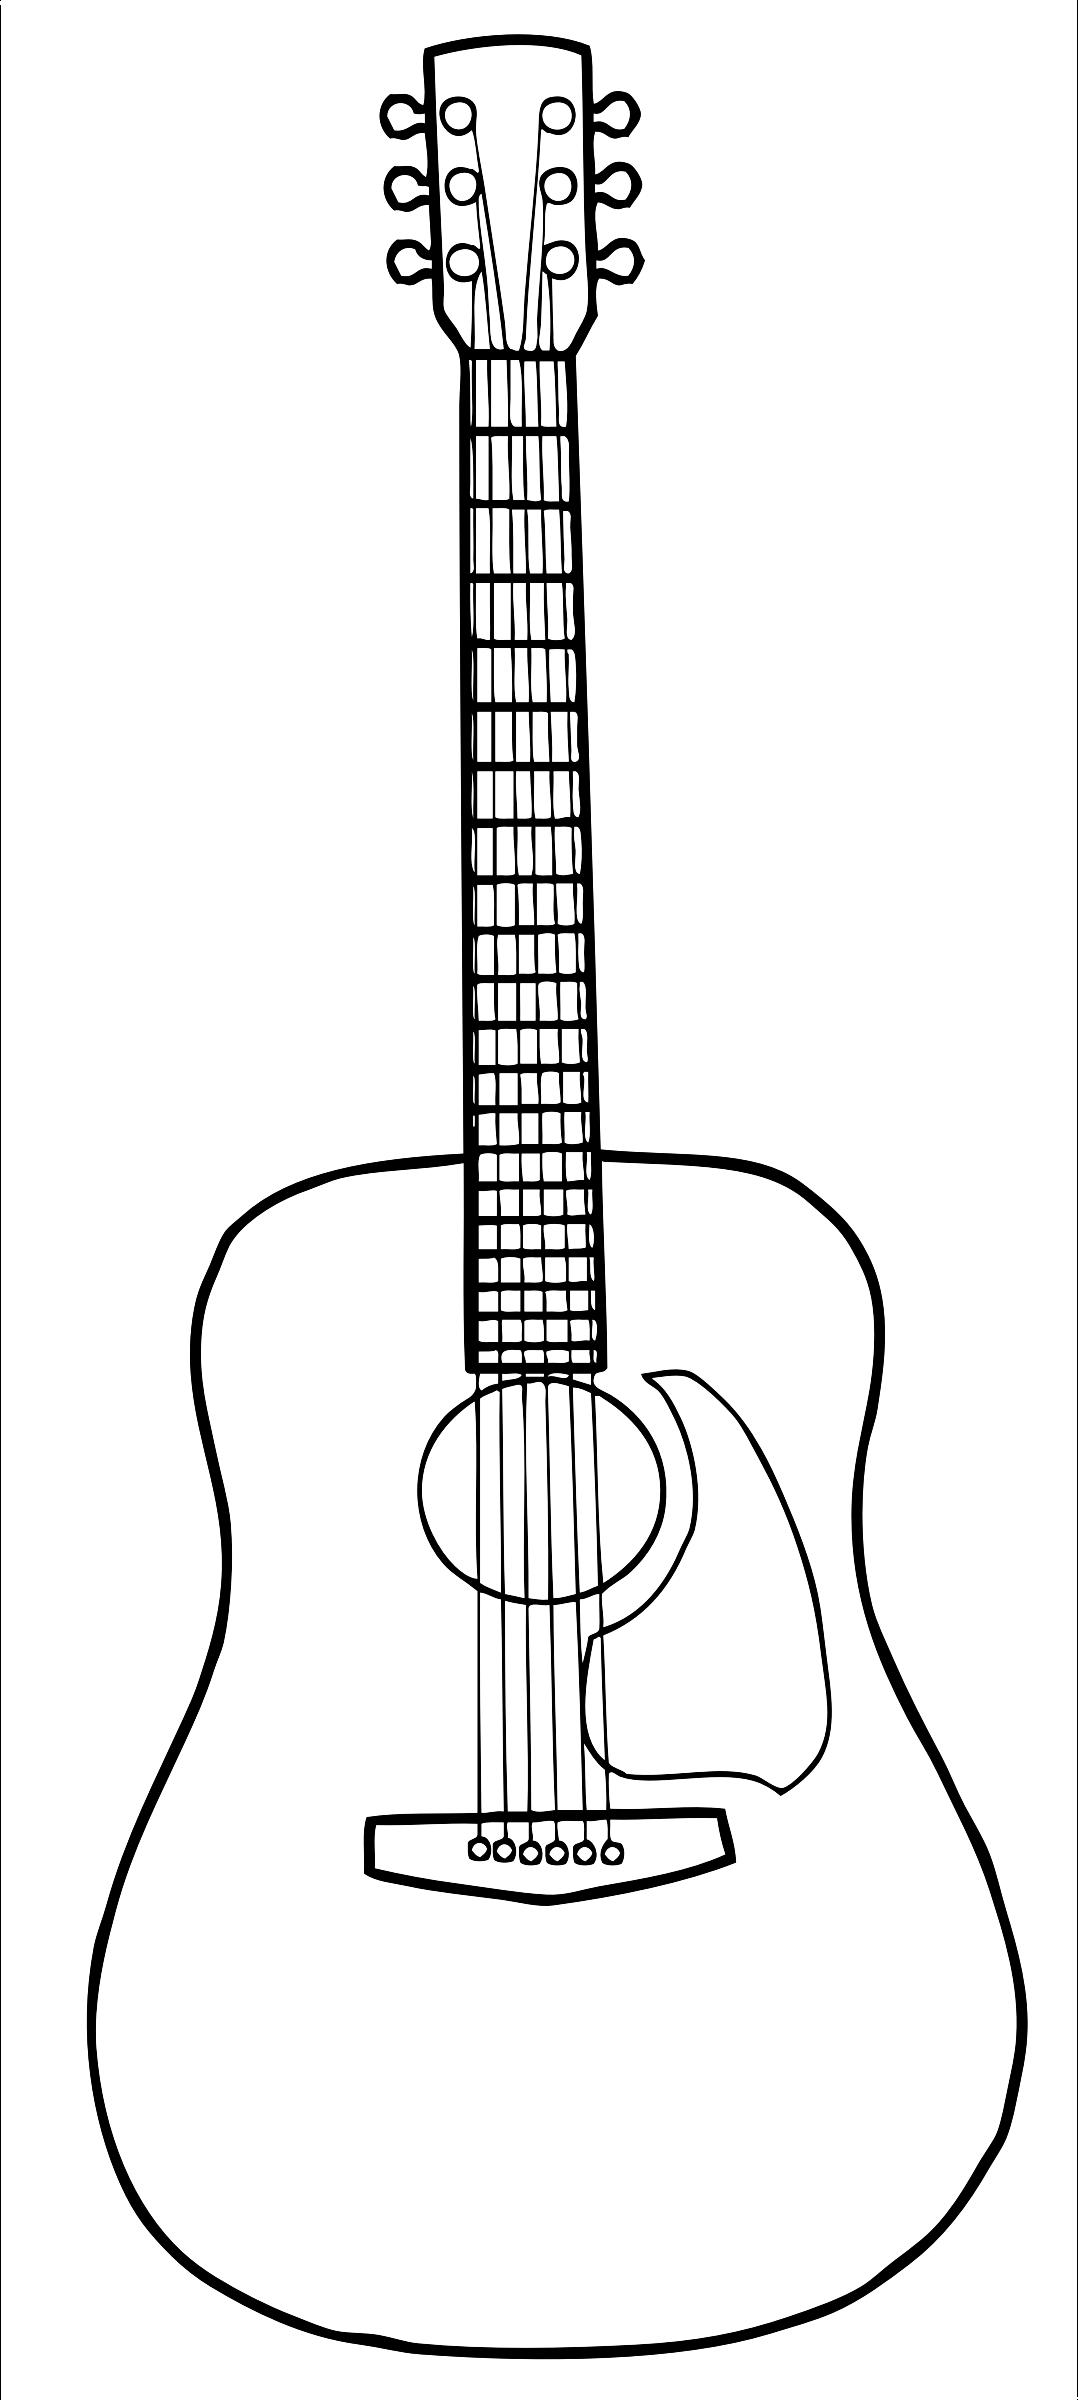 Taylor Acoustic Guitars Tayloracousticguitars Guitar Drawing Guitar Art Guitar